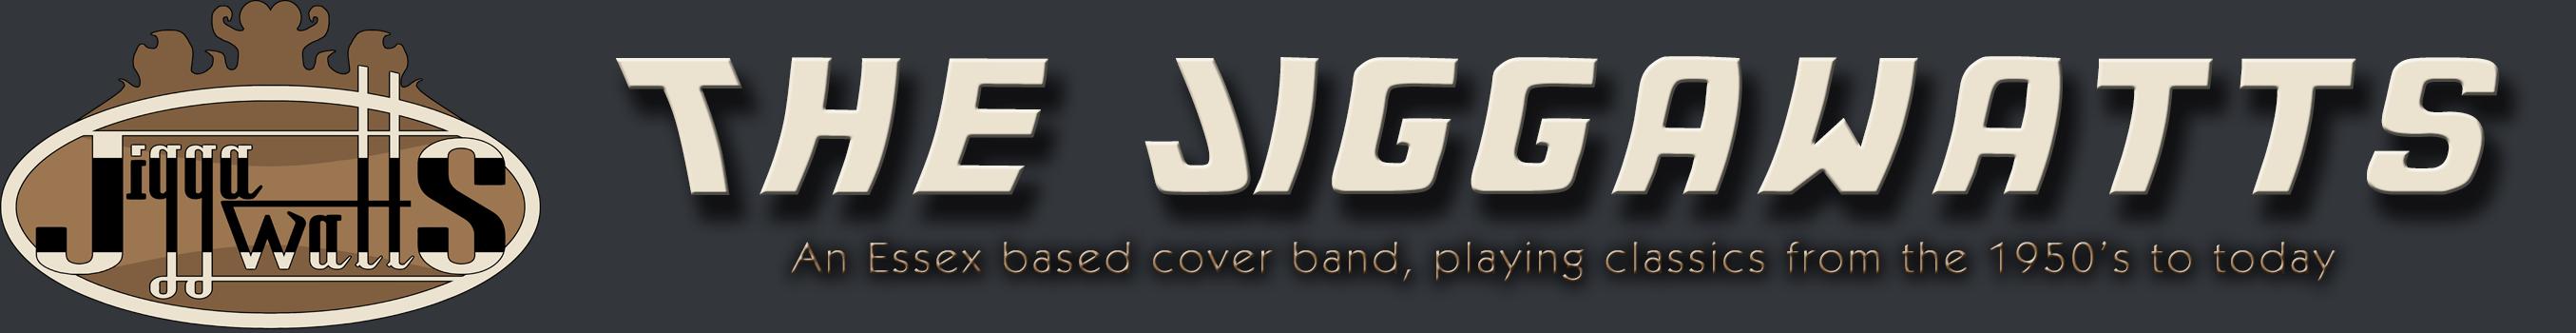 The Jiggawatts